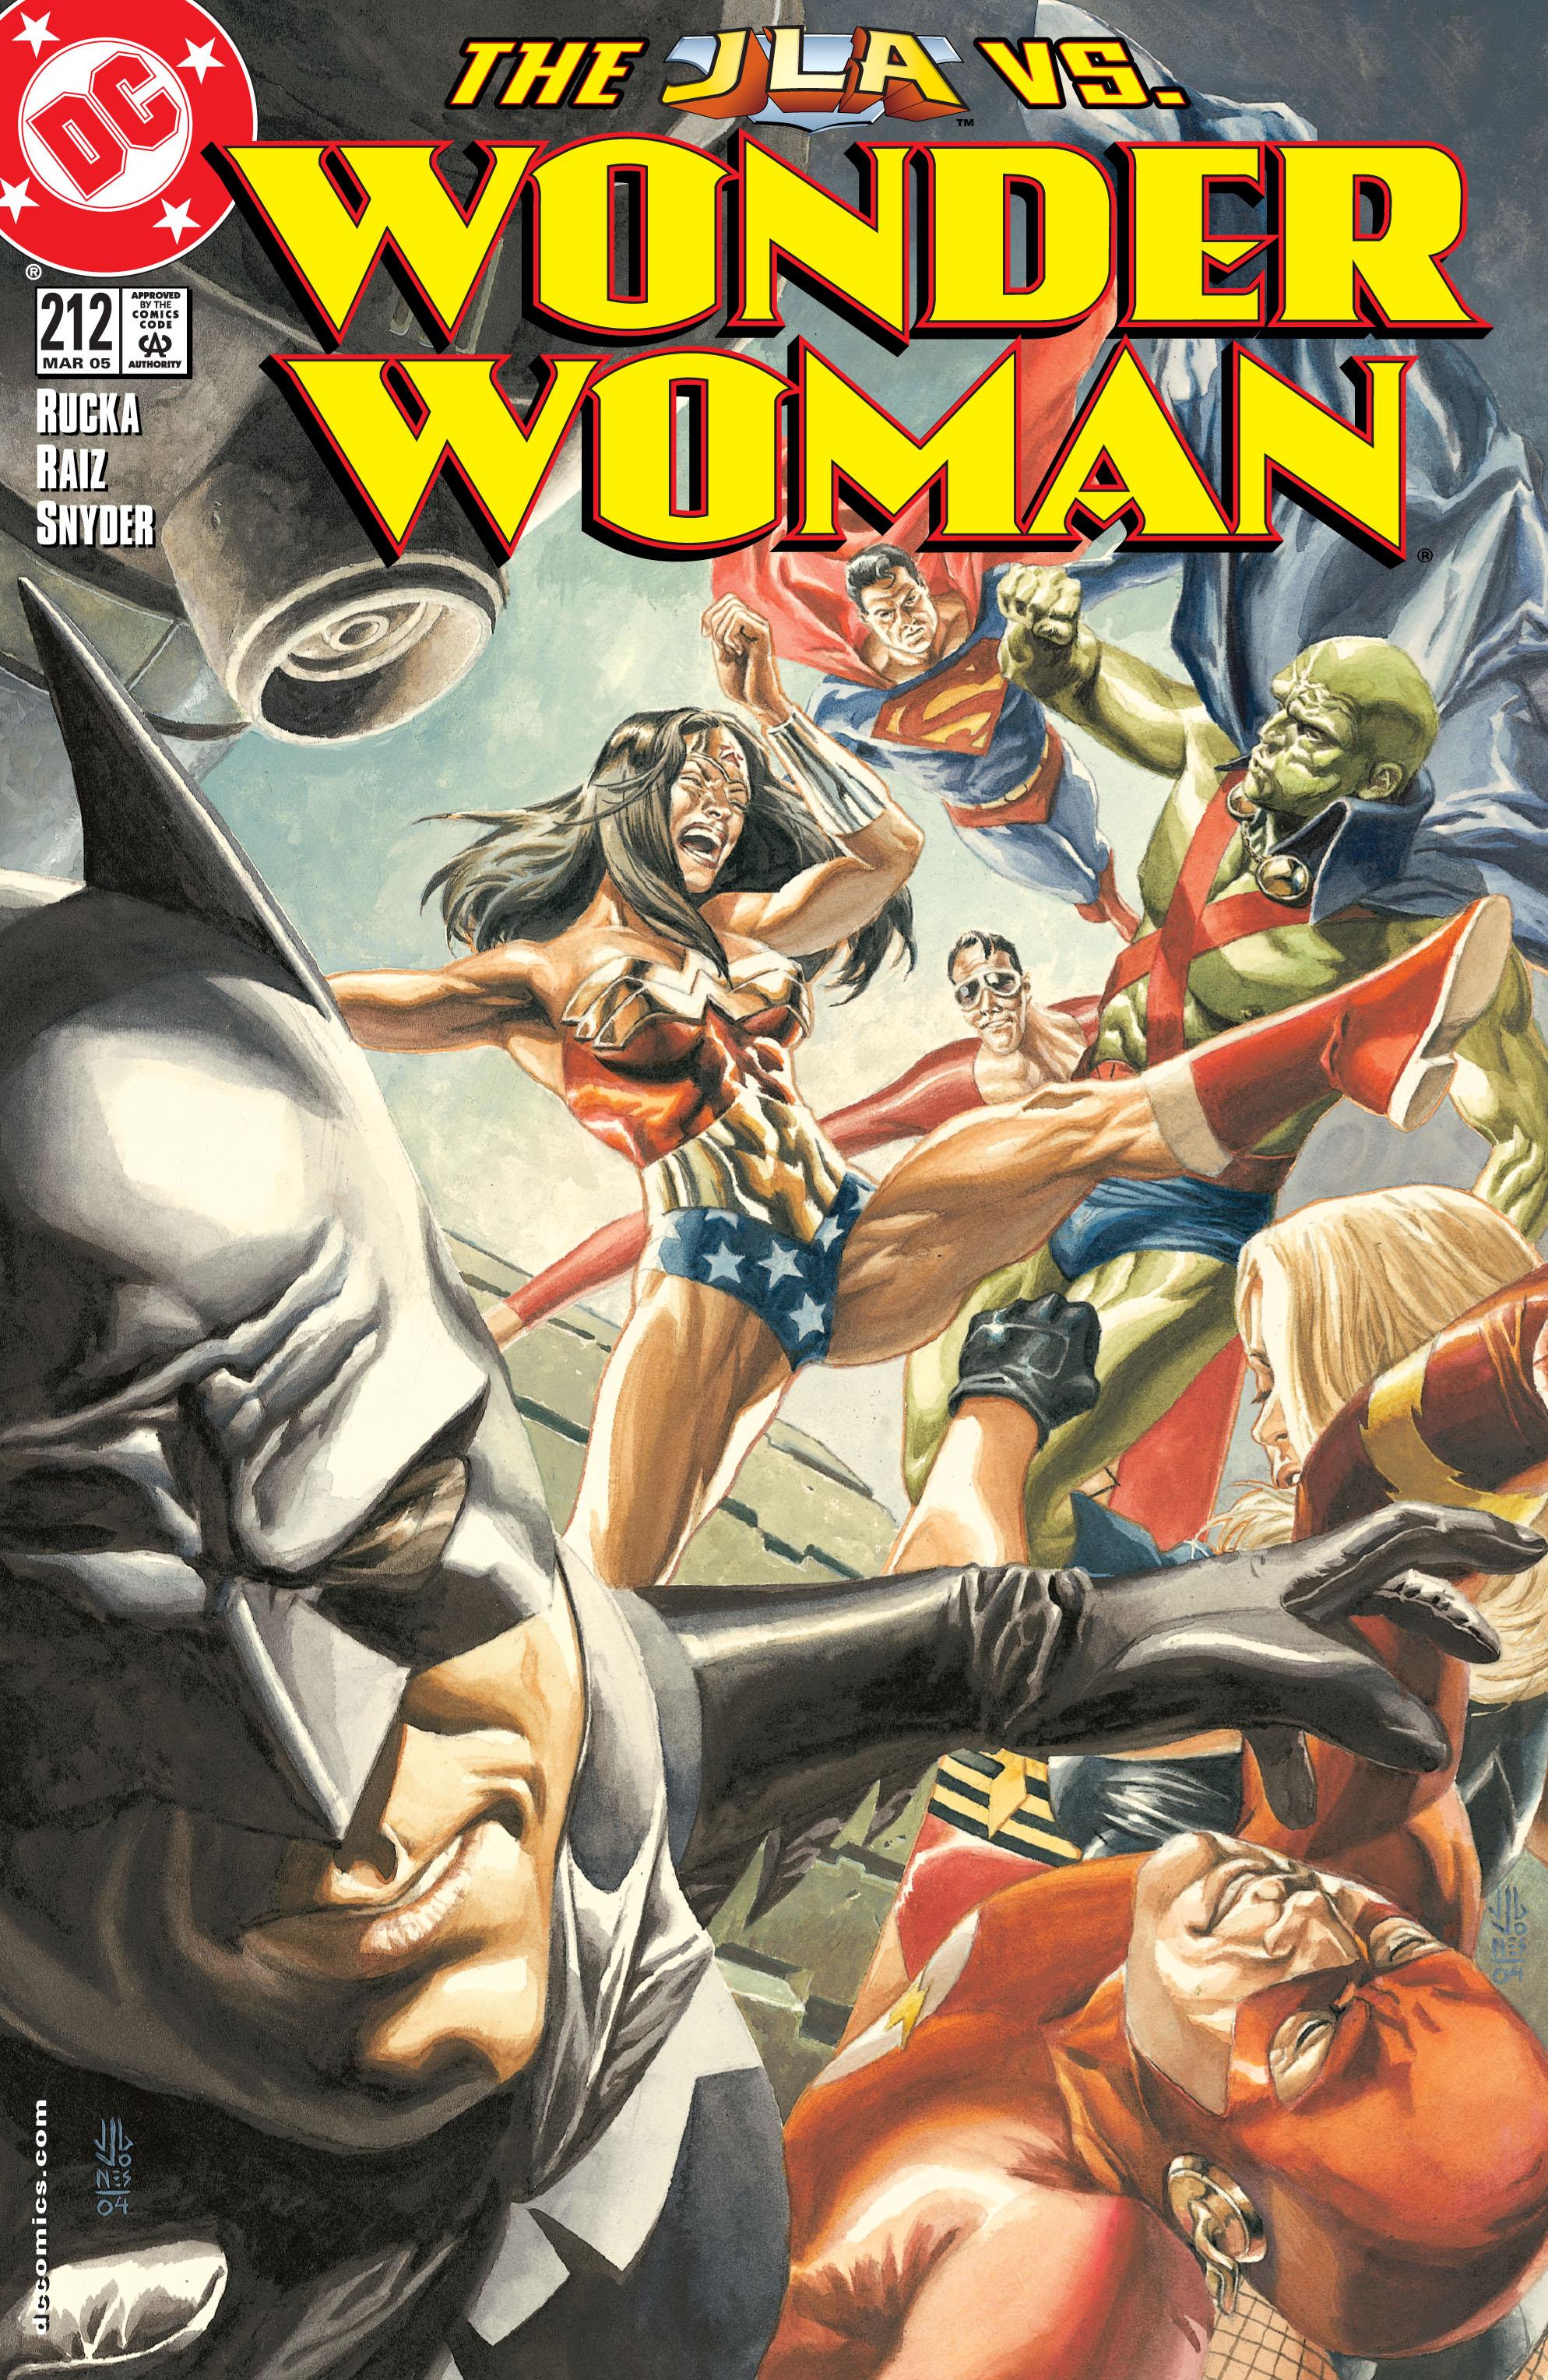 Read online Wonder Woman (1987) comic -  Issue #212 - 1